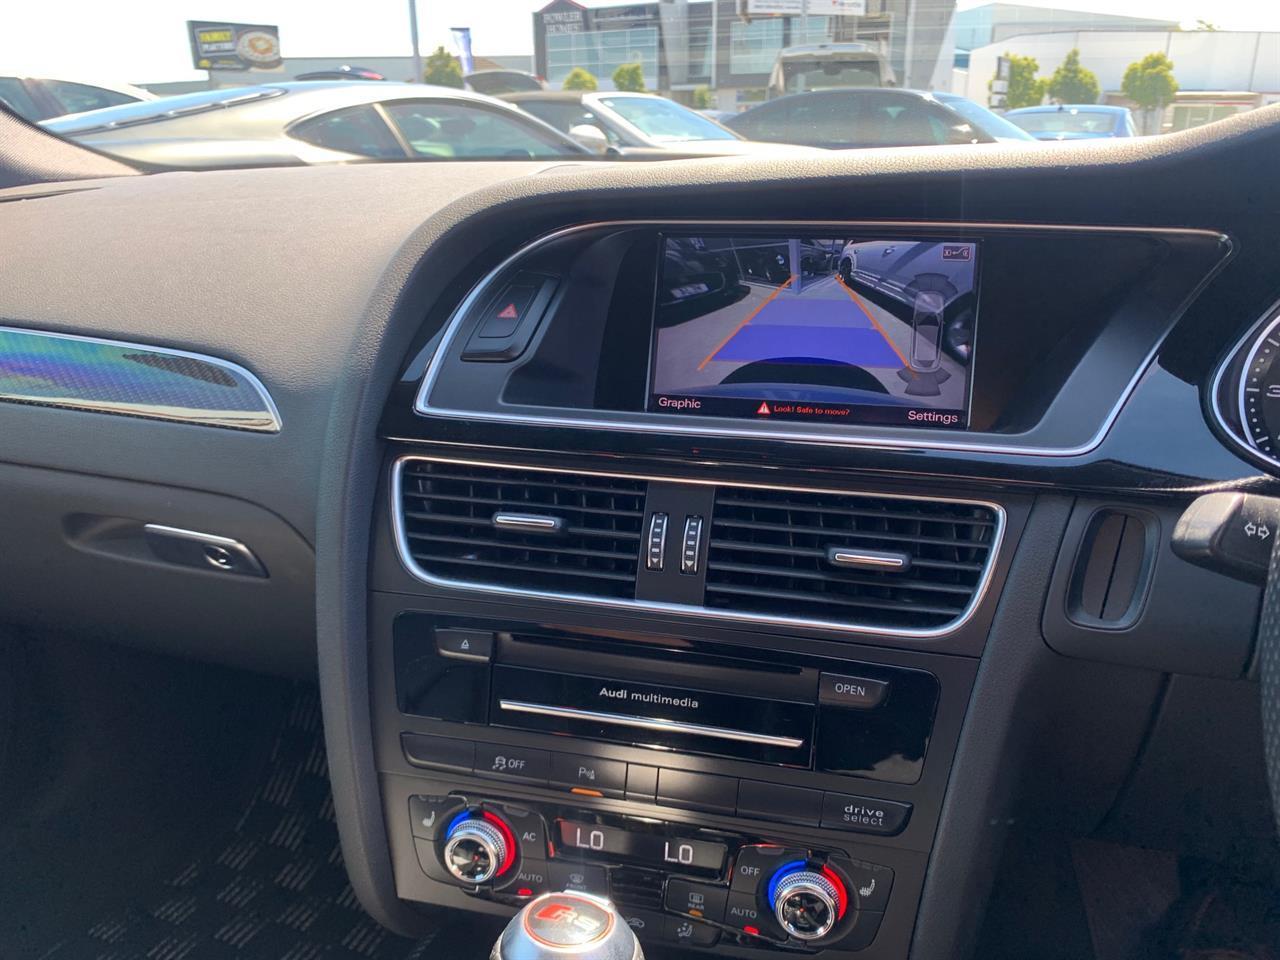 image-11, 2013 Audi RS4 4.2 V8 Quattro FSI Wagon at Christchurch